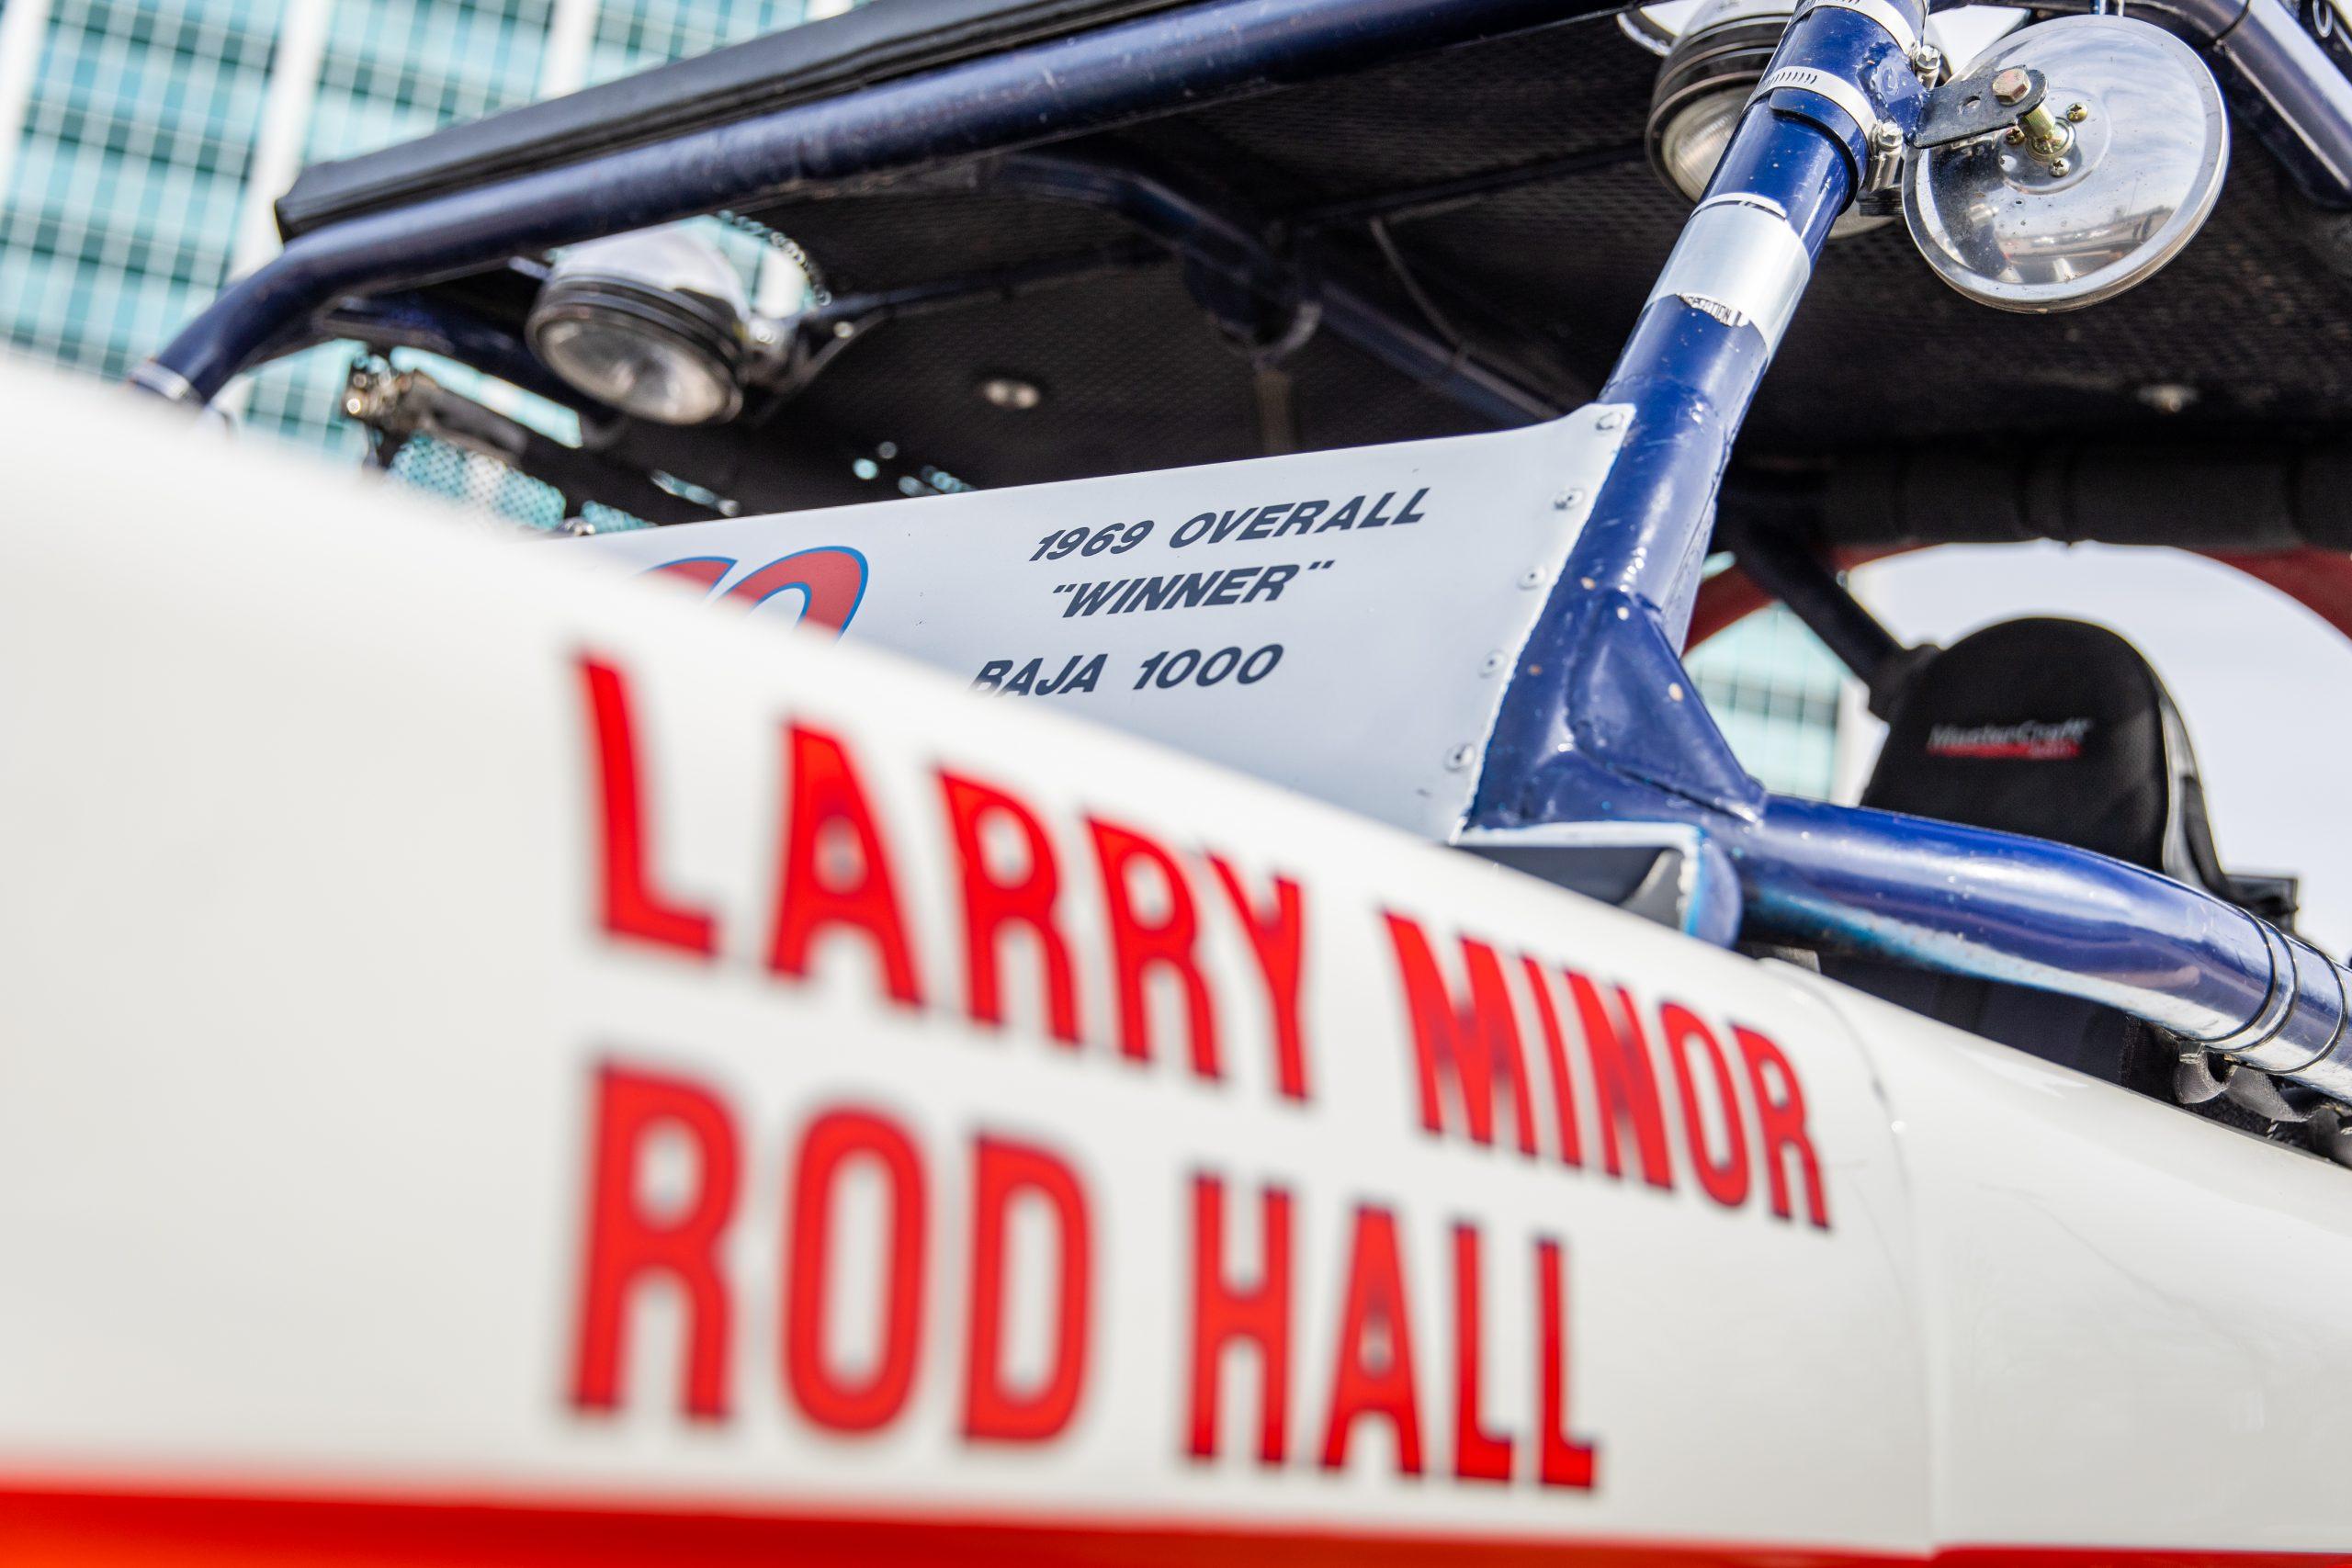 Larry Minor Rodd Hall Baja racing Bronco